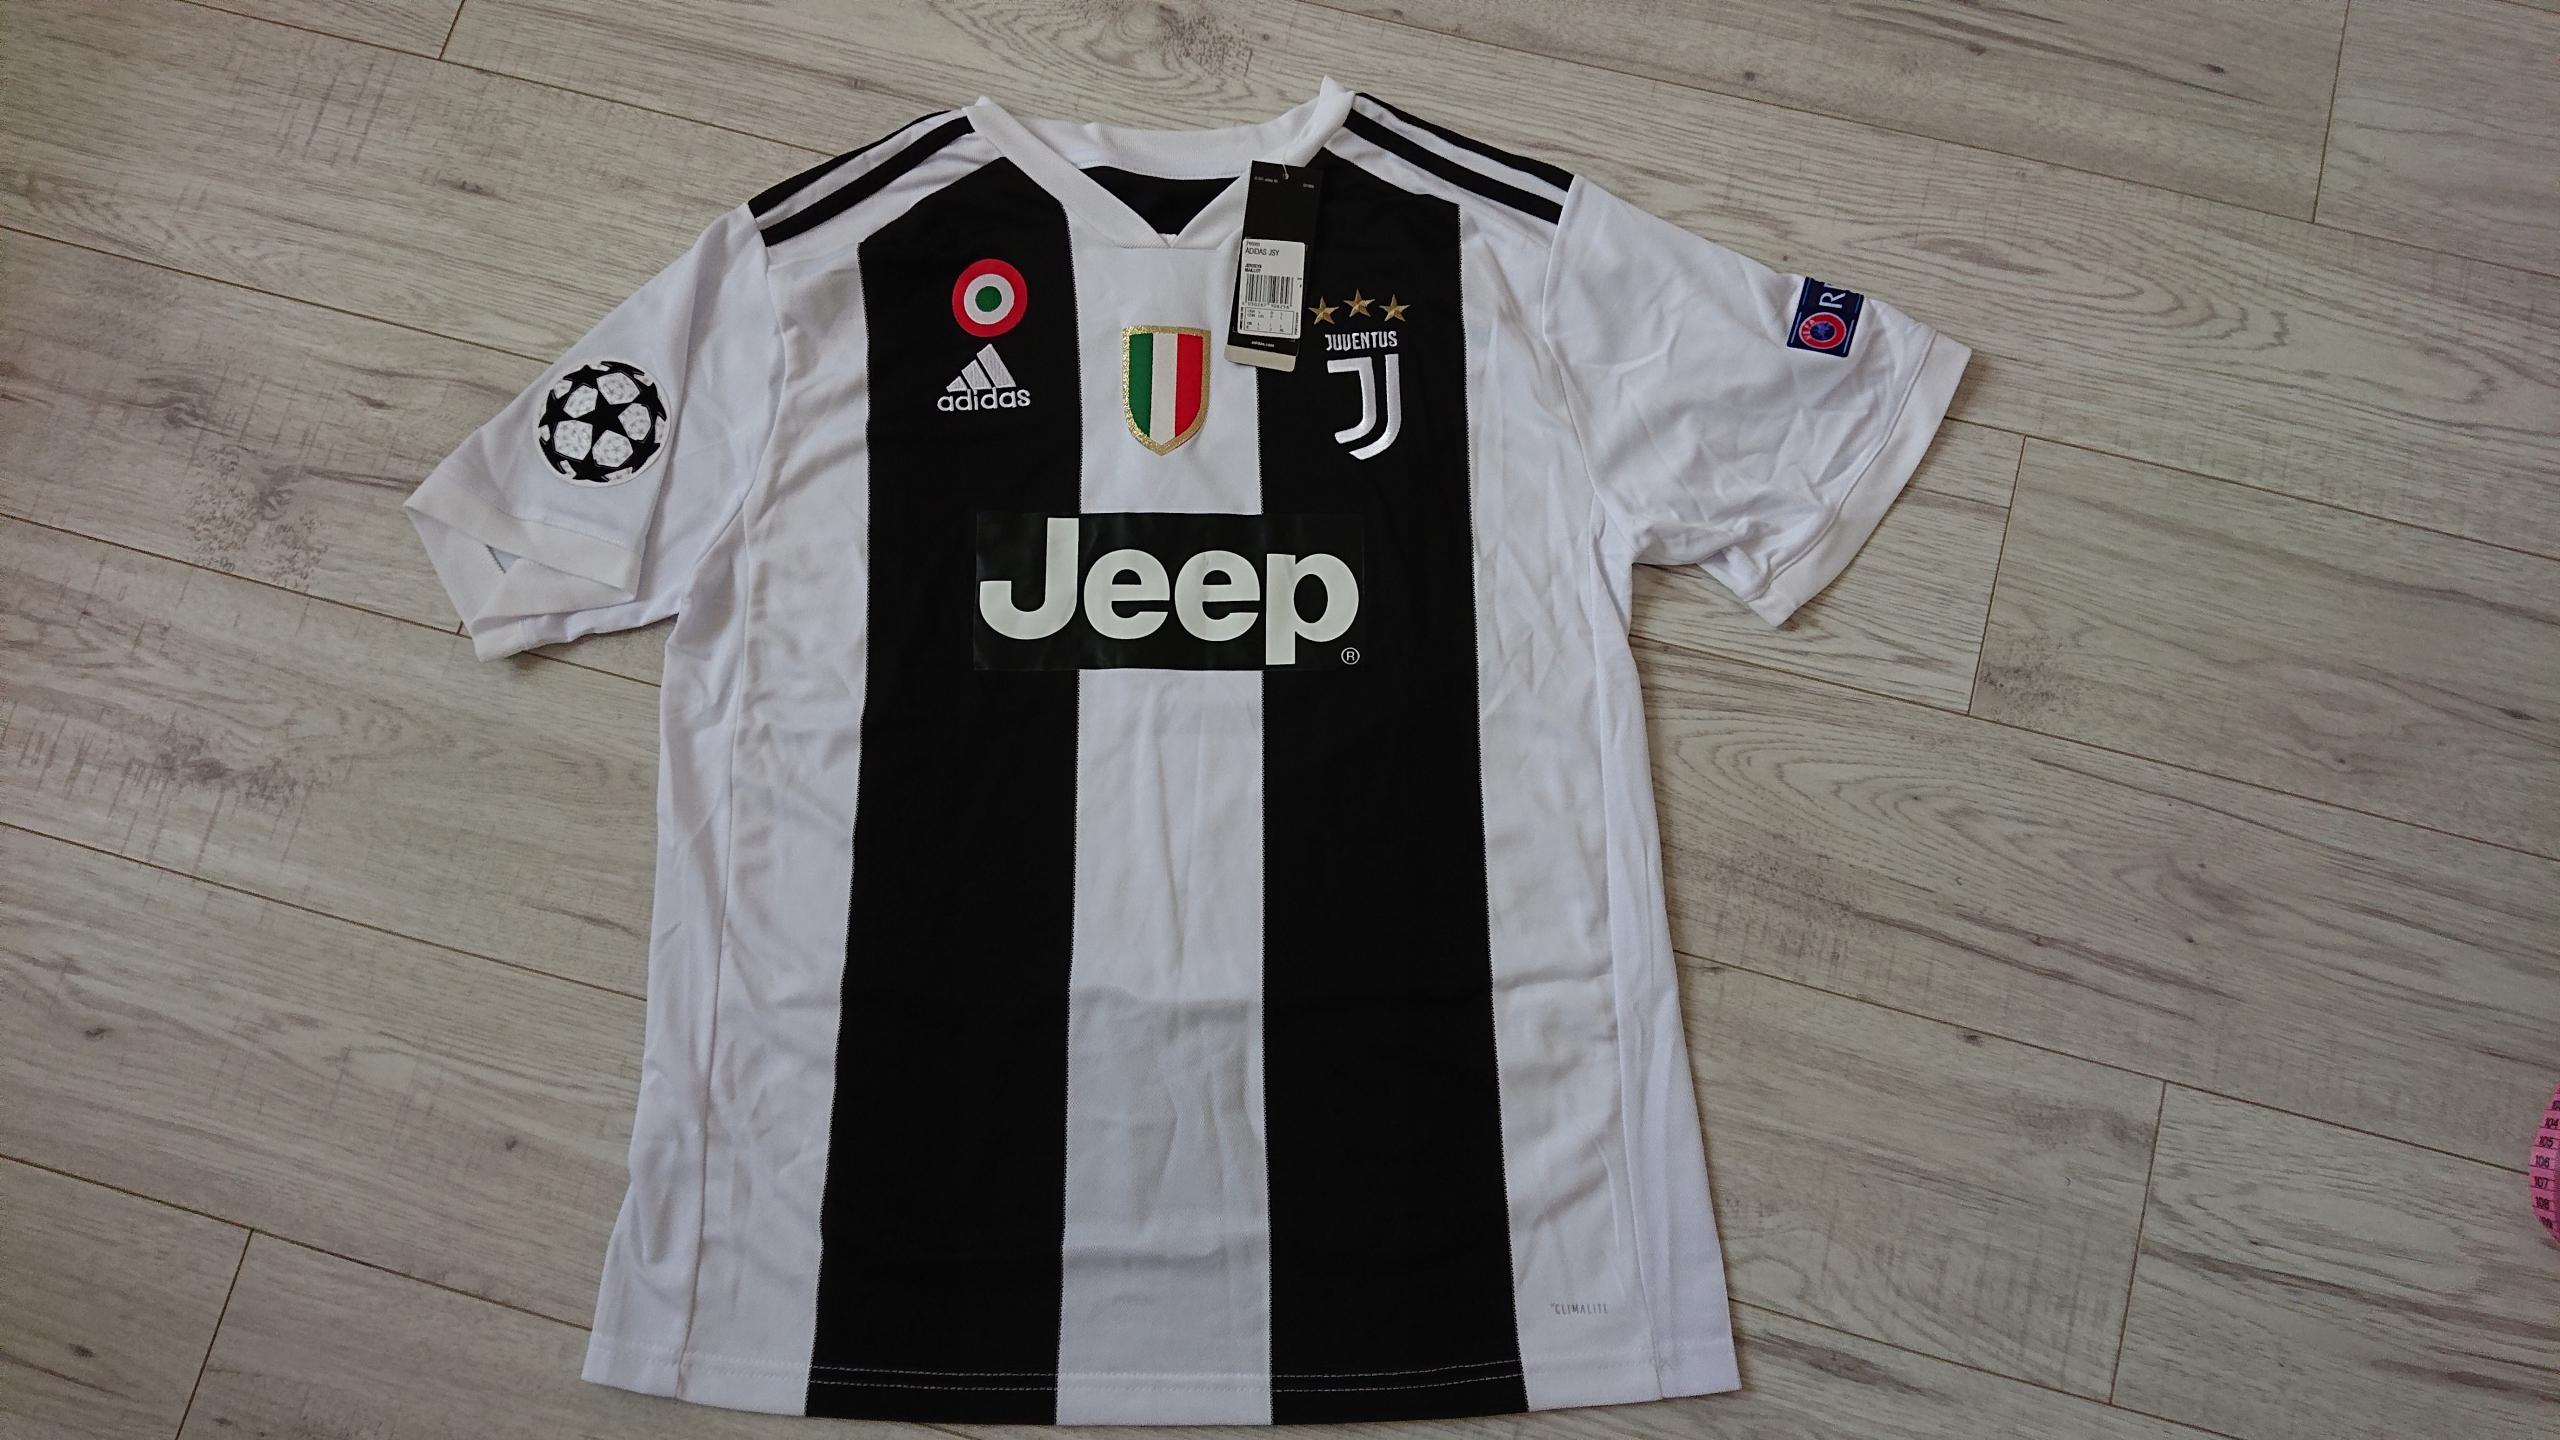 Koszulka Adidas Juventus Ronaldo Champions League